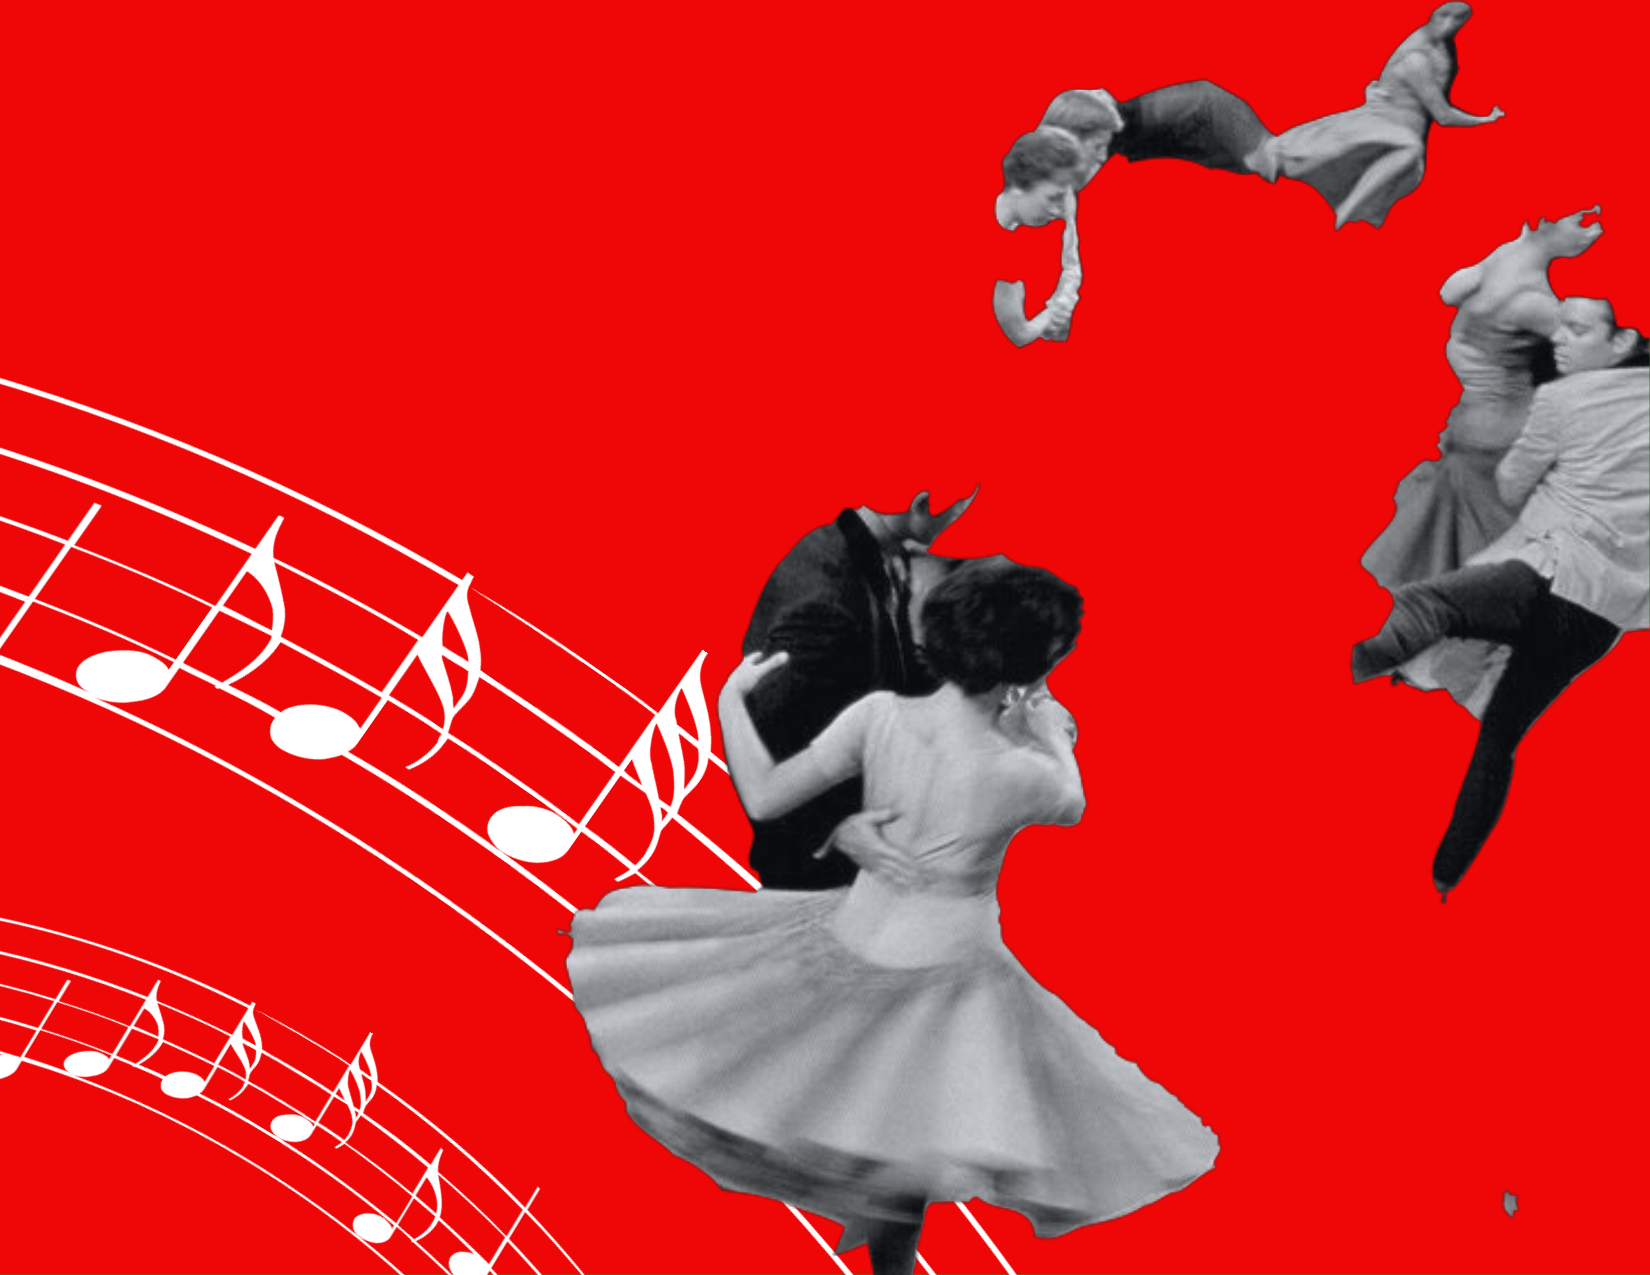 FairlyChatty presents: Les chansons qui ont changé ma vie II